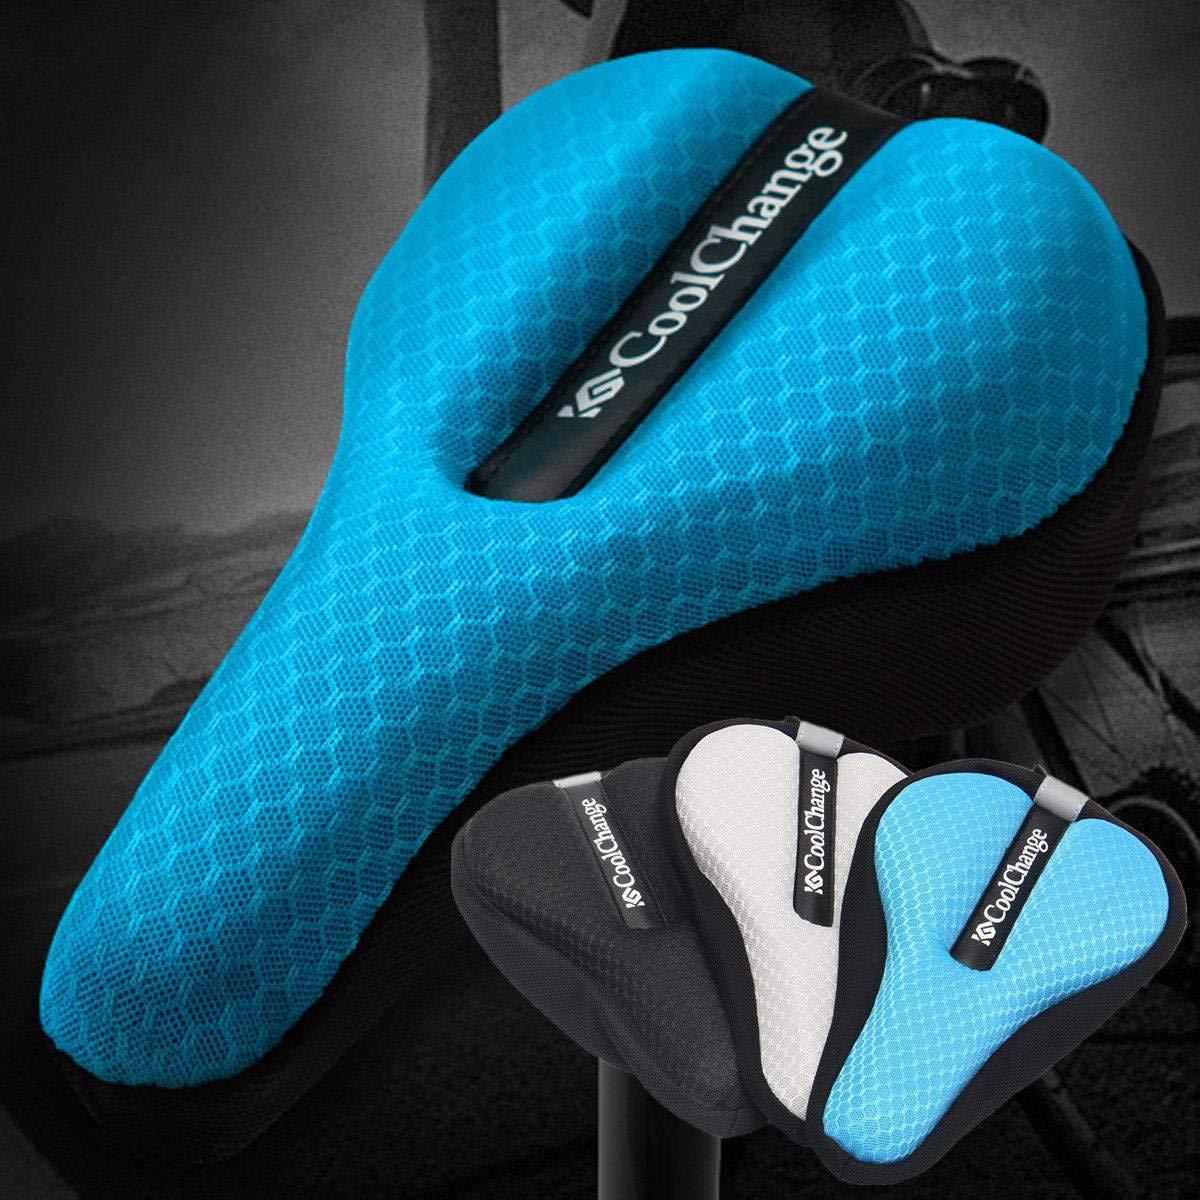 vivpro Silicone Gel Extra Soft Bicycle Bike MTB Saddle Cushion Seat Cover Pad Comfort by vivpro (Image #6)